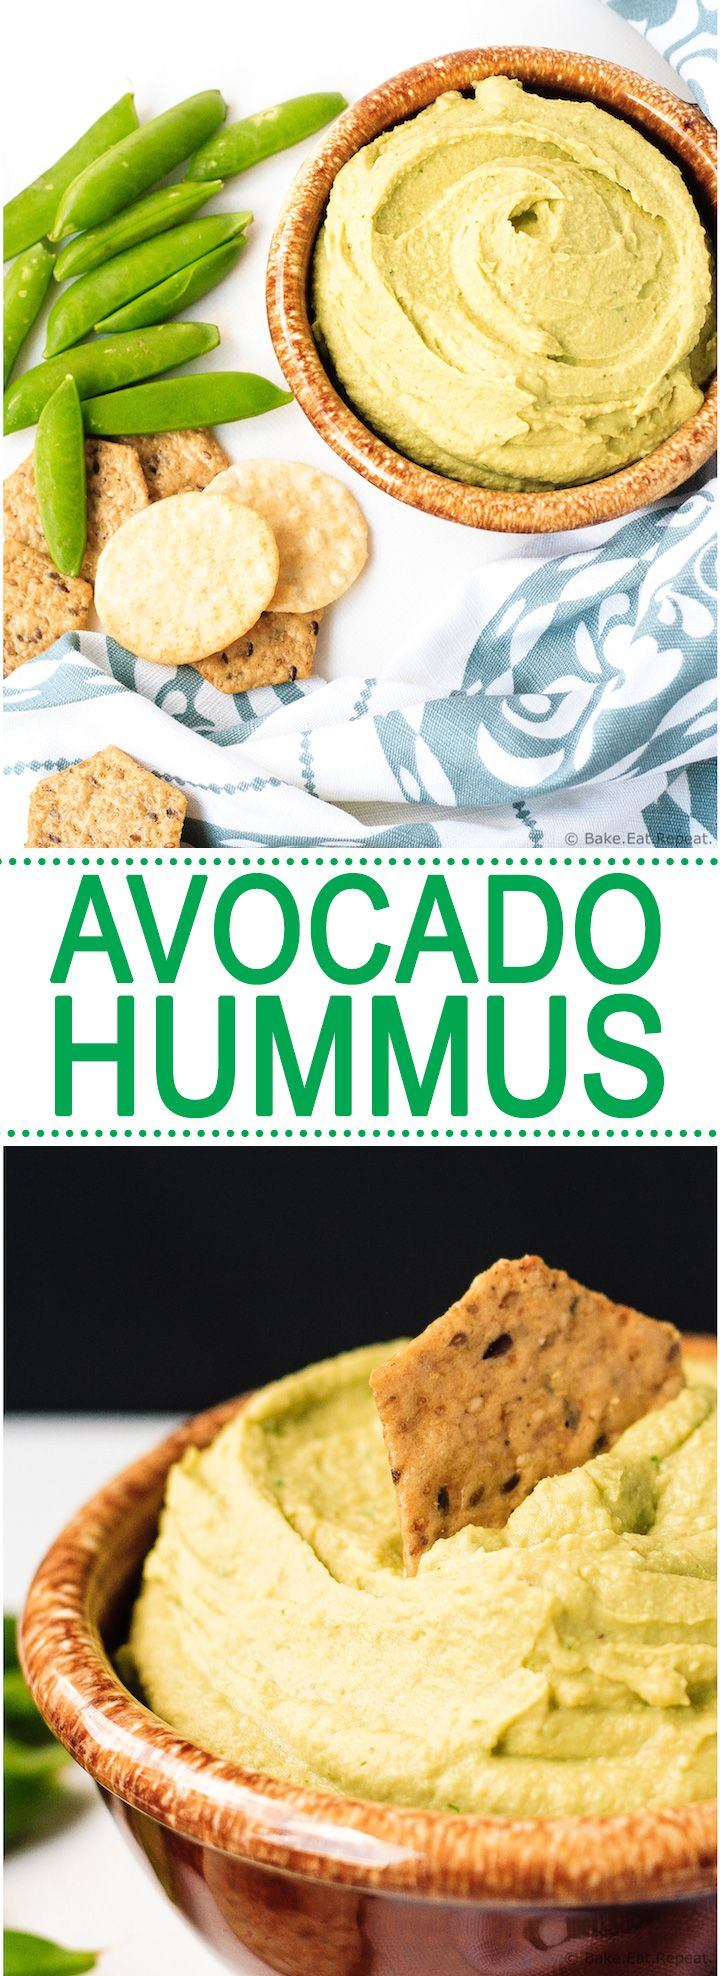 1000+ ideas about Avocado Hummus on Pinterest | Skinny ...